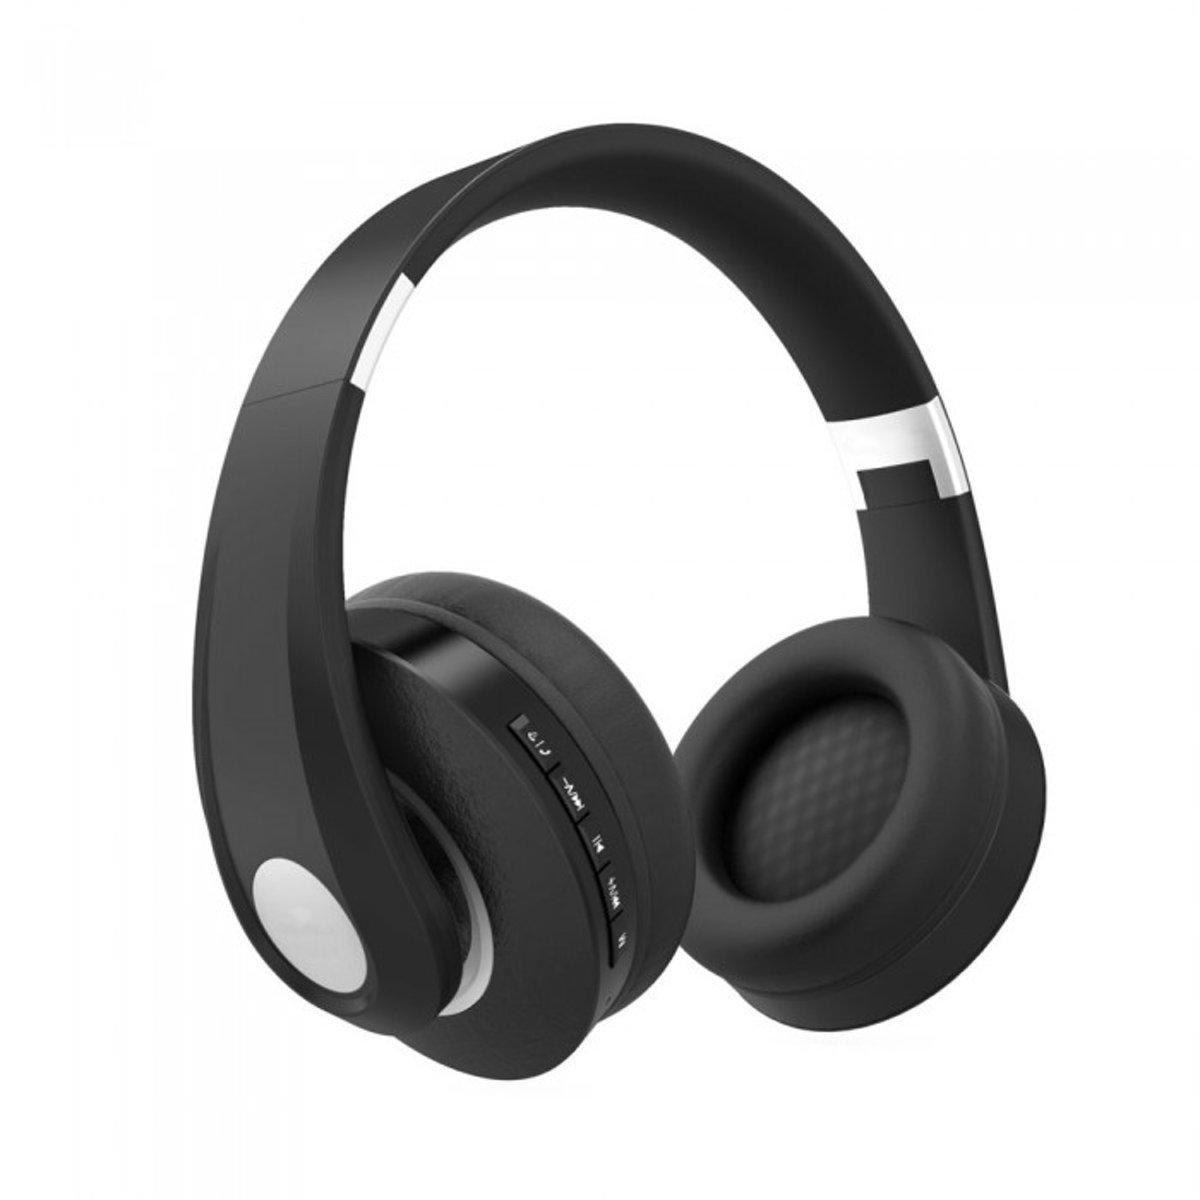 V-tac VT-6322 Bluetooth draadloze koptelefoon - verstelbaar - zwart